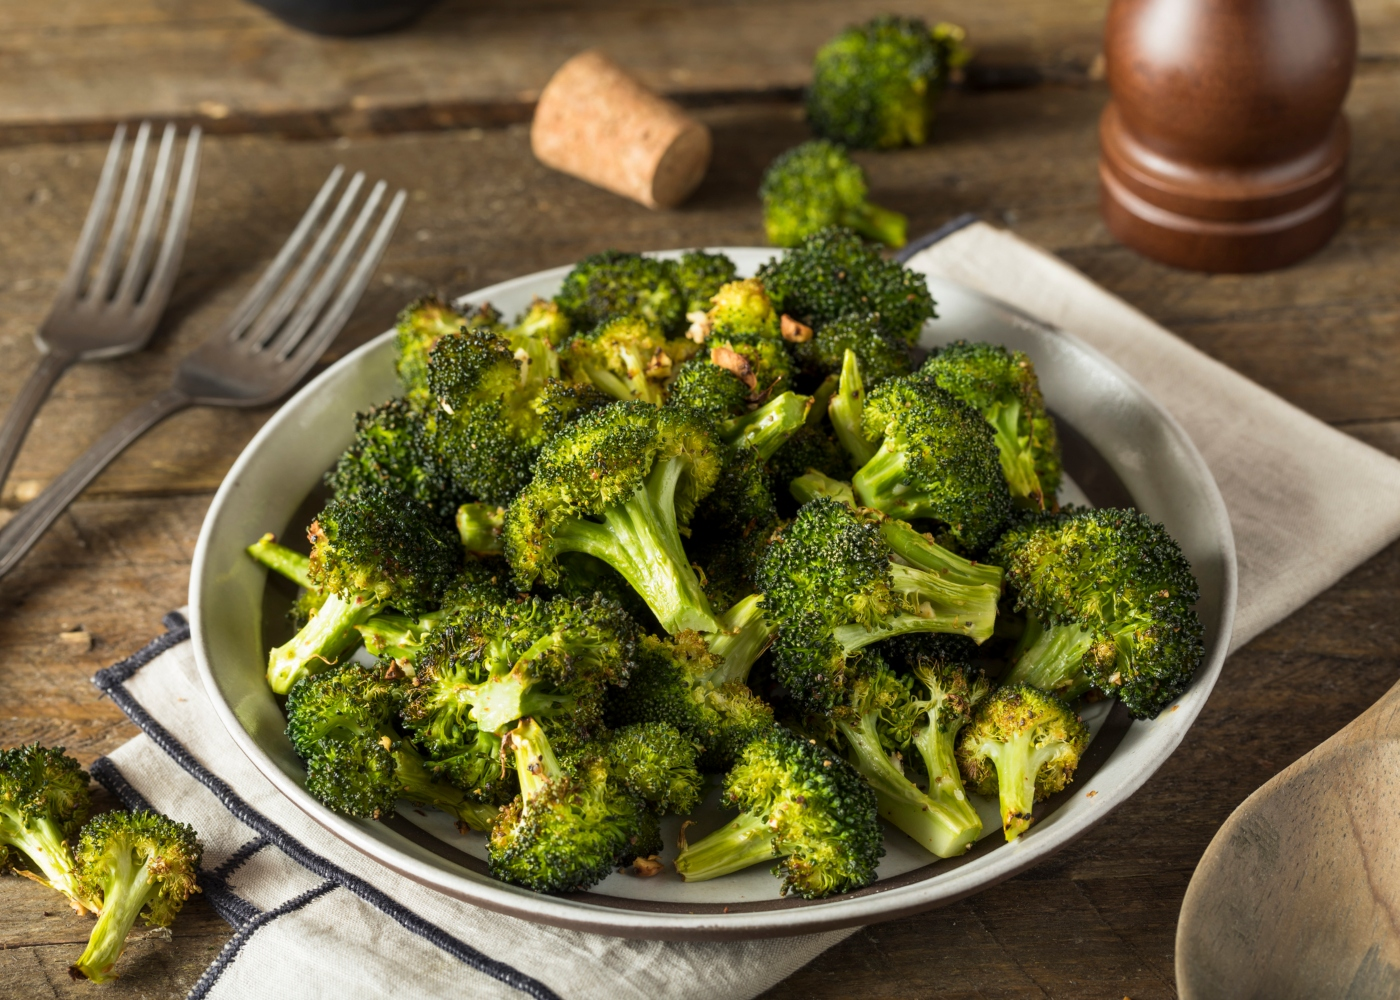 brócolos no forno no prato branco